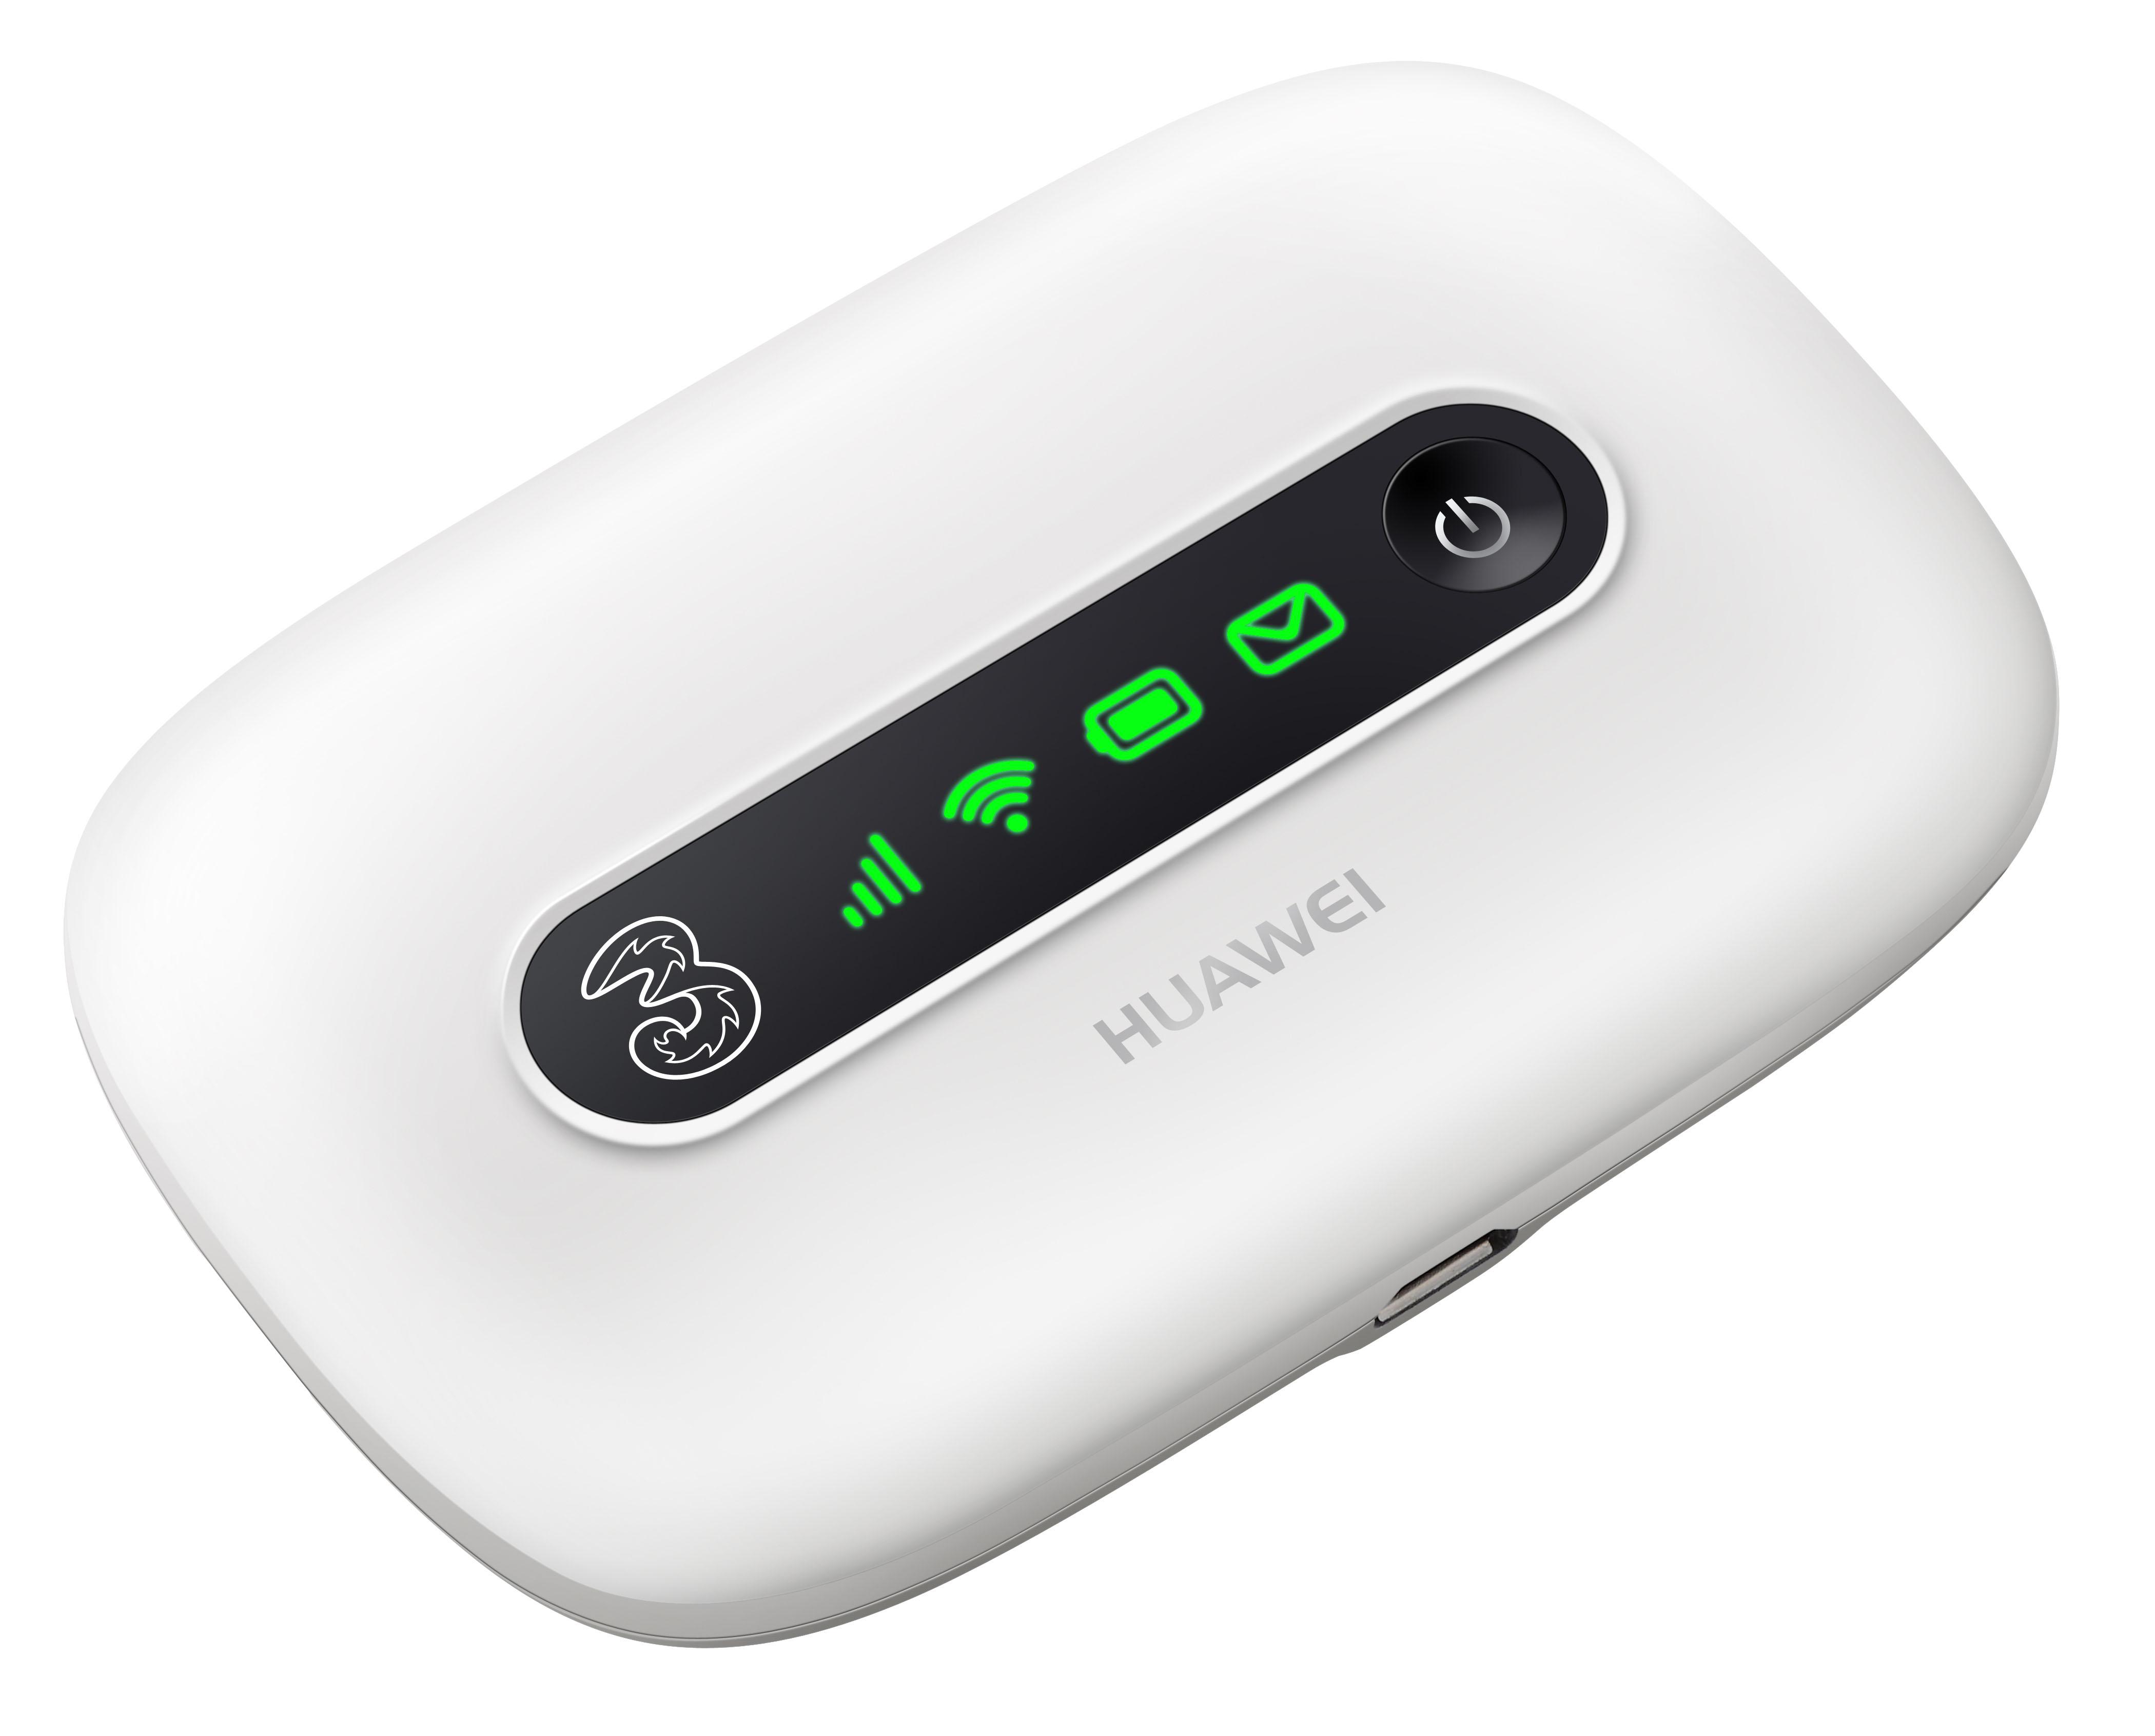 huawei vodafone r206 3g mobile wifi hotspot  eBay